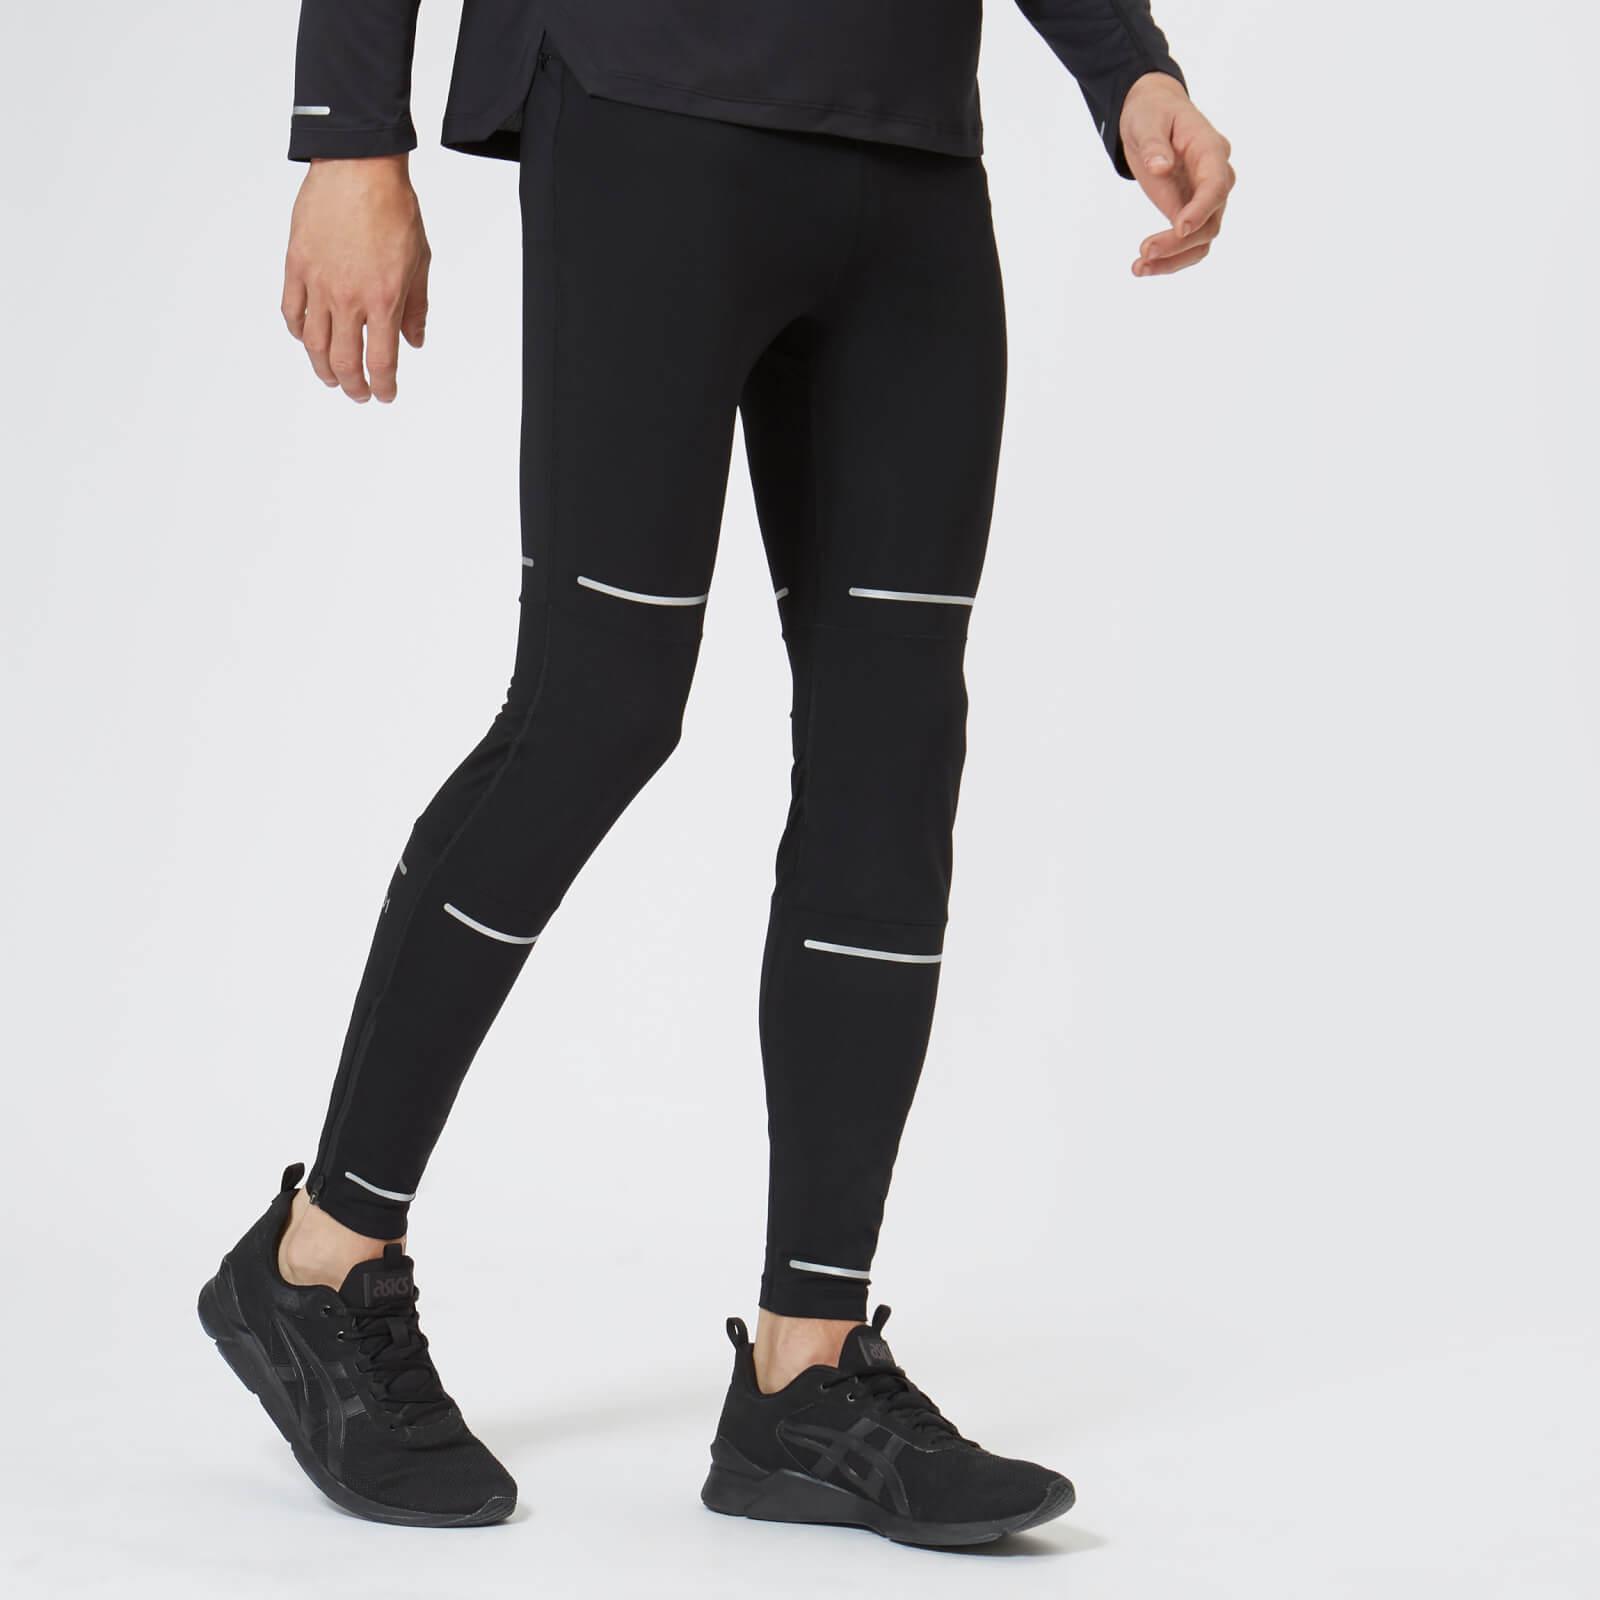 asics tights